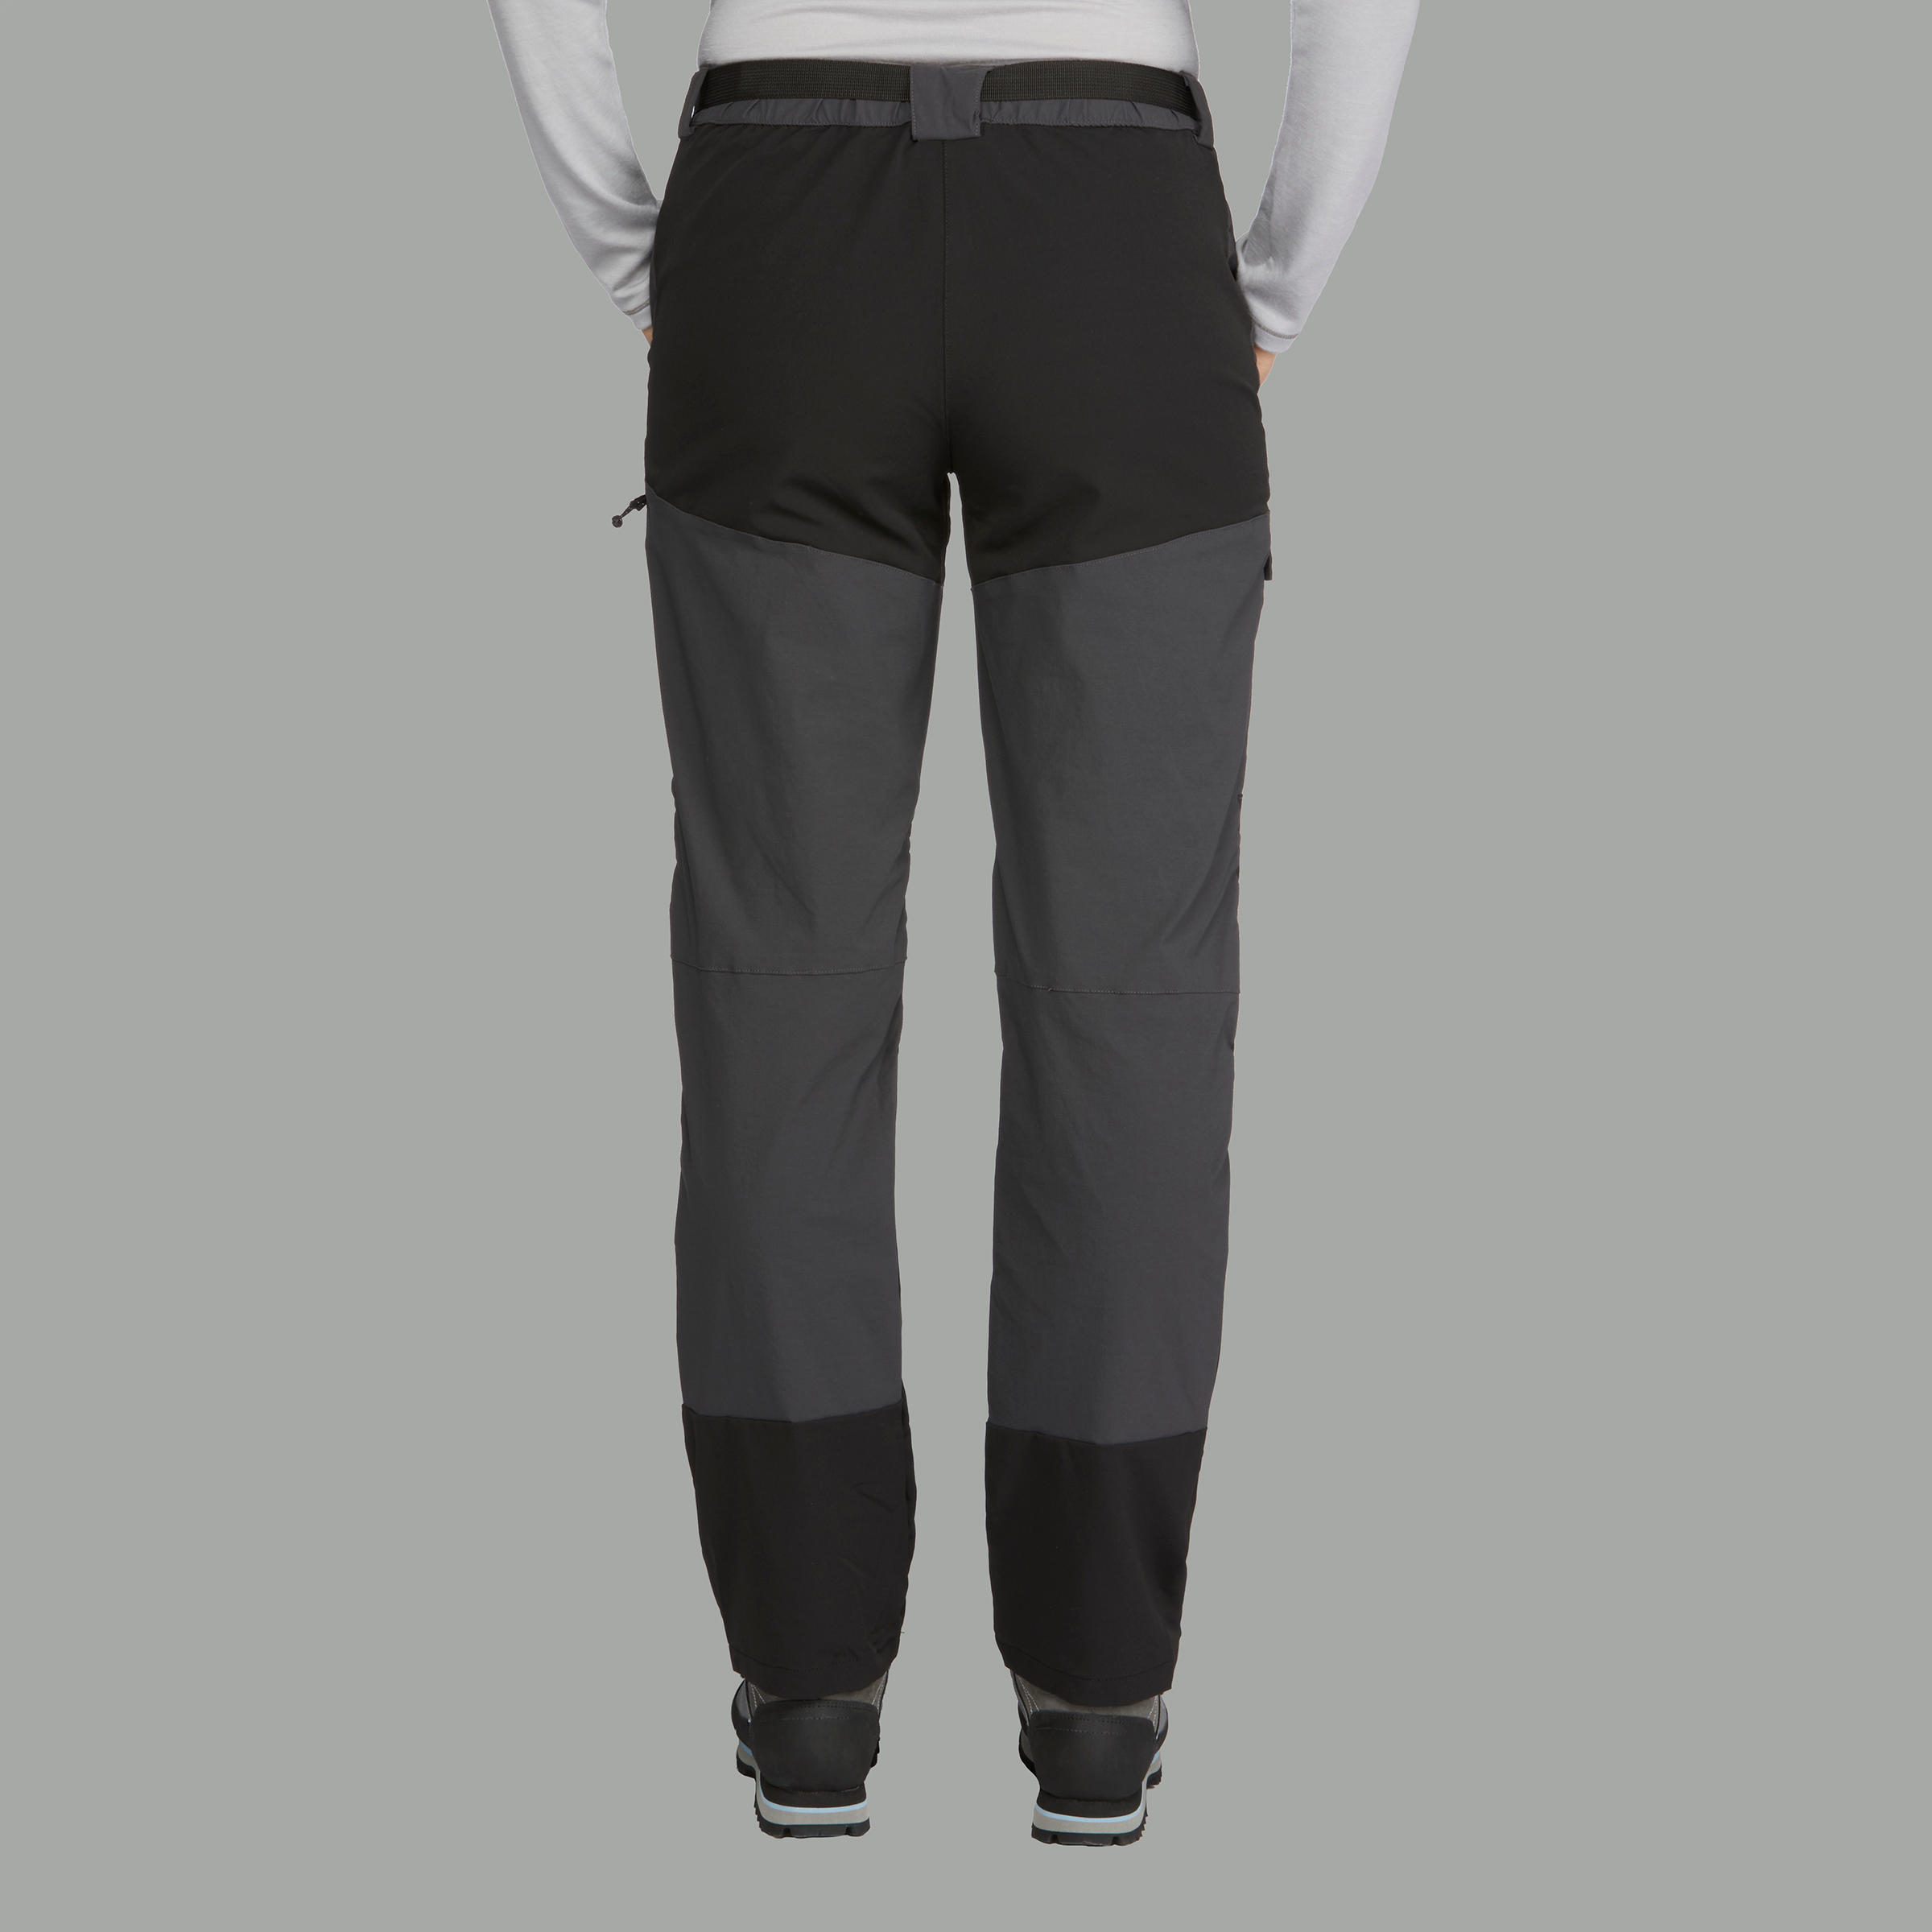 Women's TREK 500 mountain trekking trousers - Dark grey